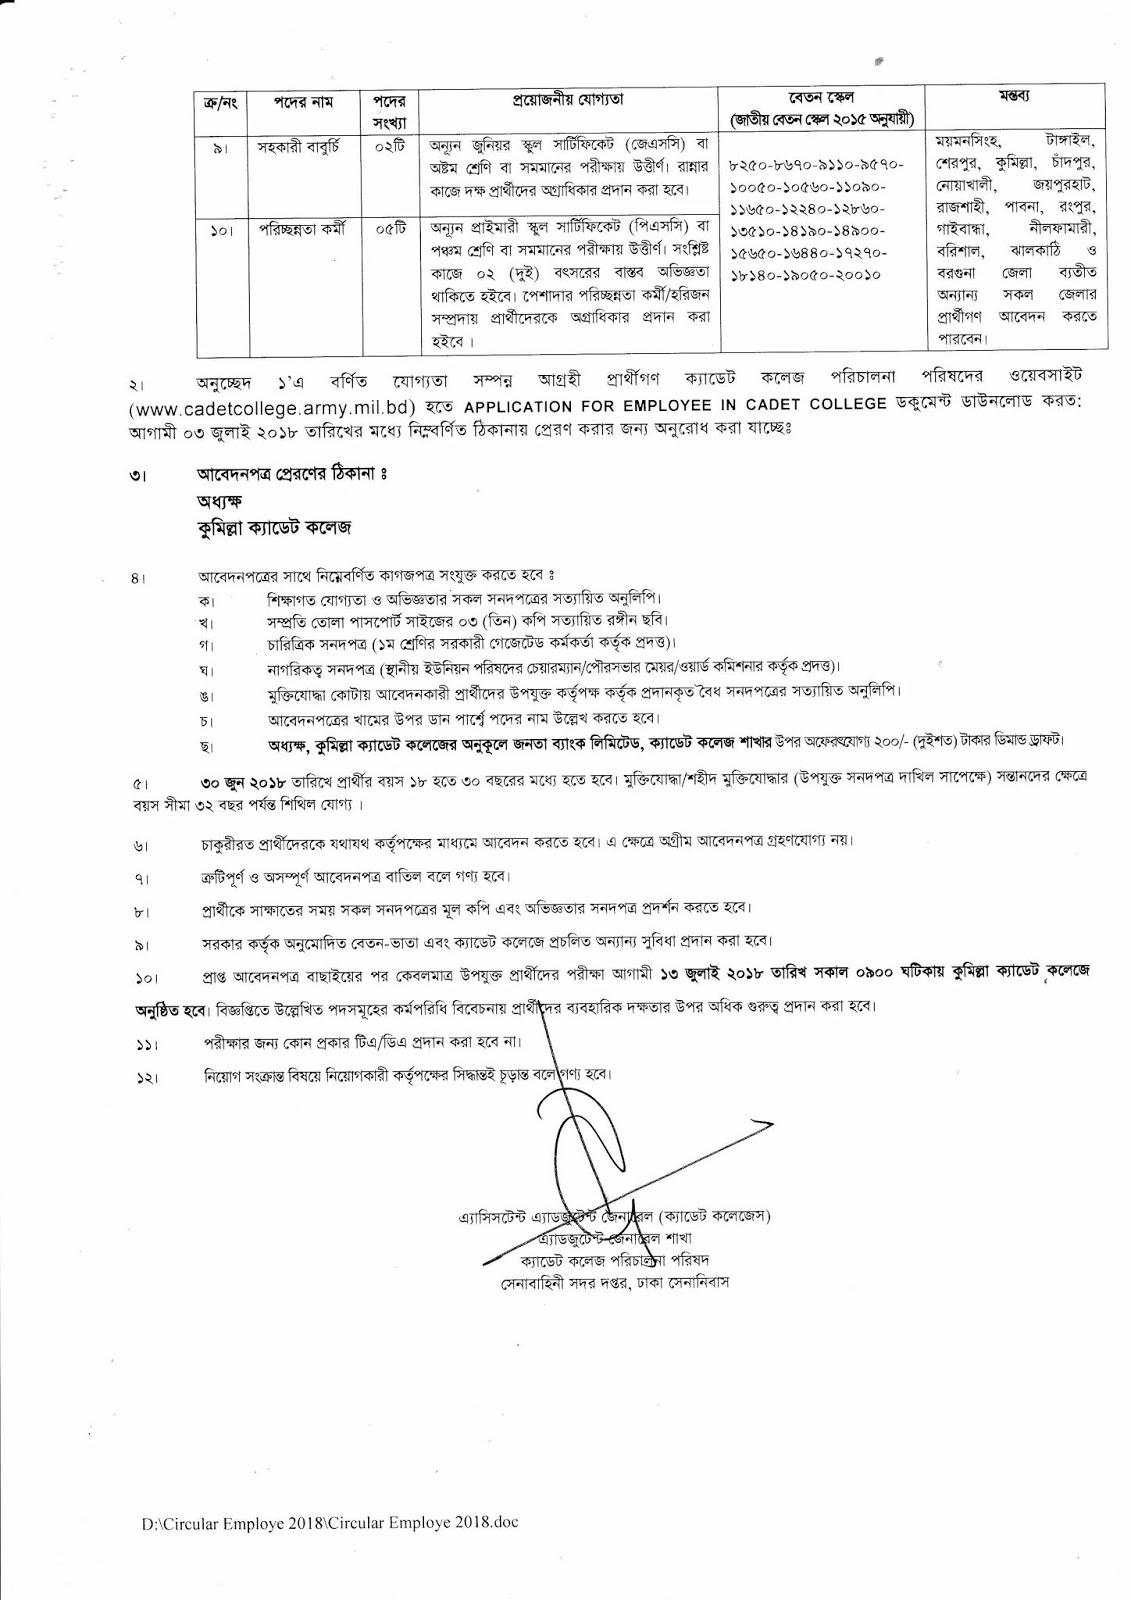 Bangladesh Cadet College Job Circular 2018